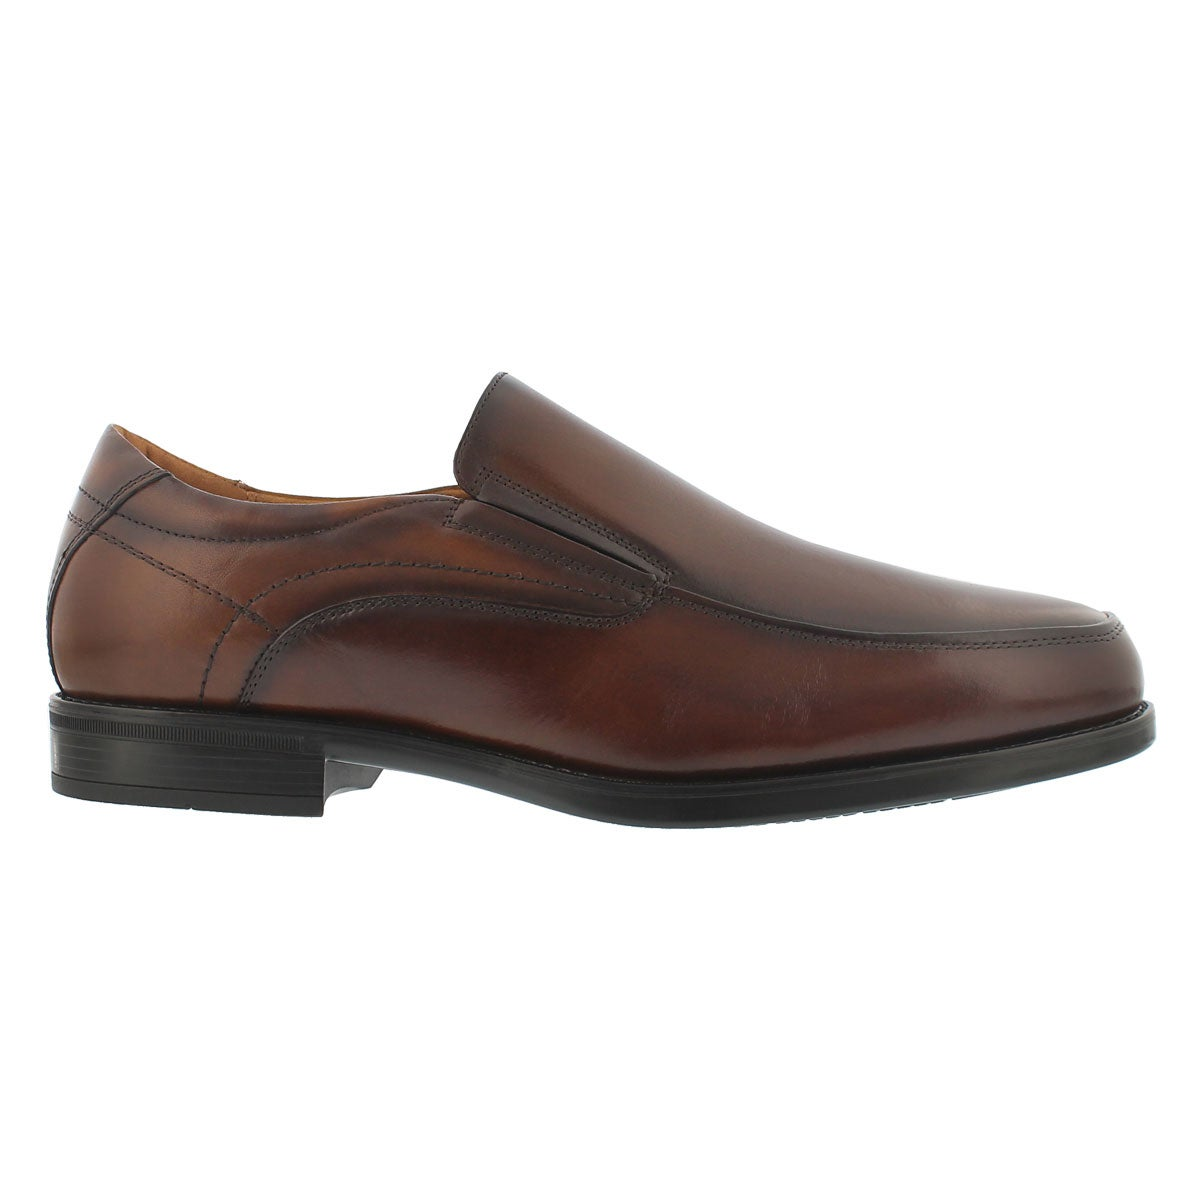 Chaussure Midtown Moc Slip, cgc, hom-Lrg